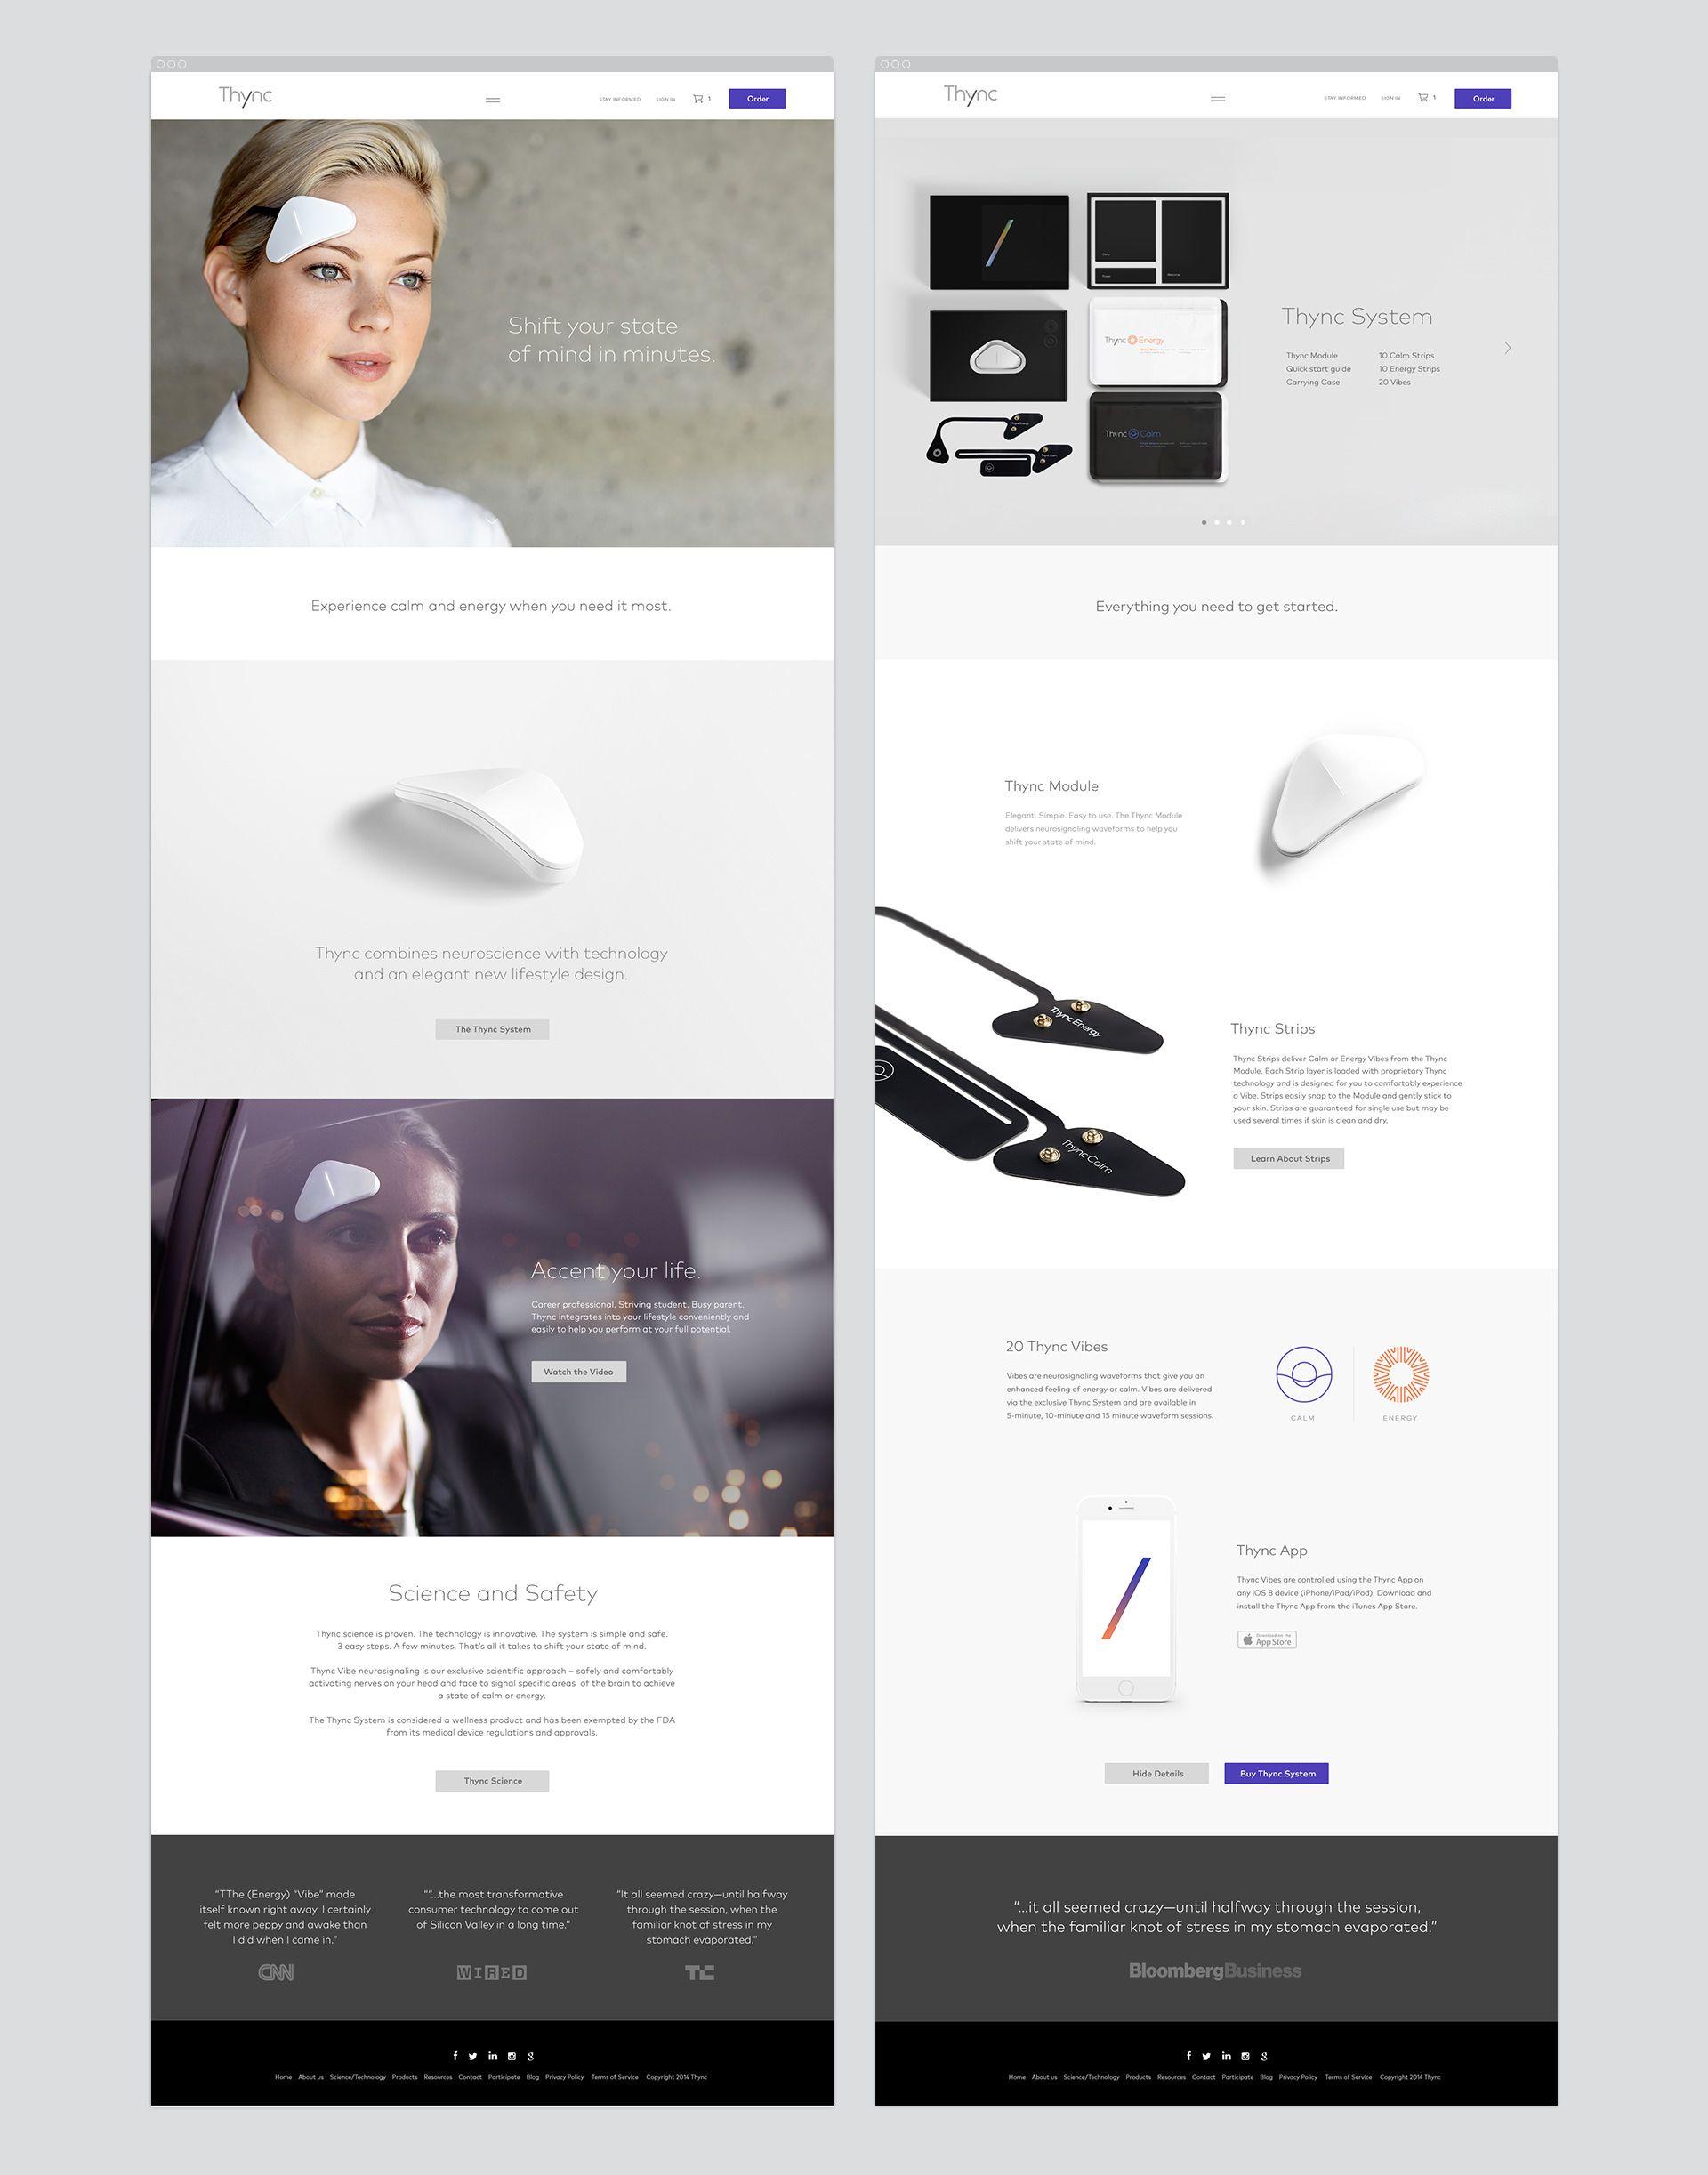 Thync Web Jpg By Matt Carvalho Fun Website Design Web Design Resources Web Design